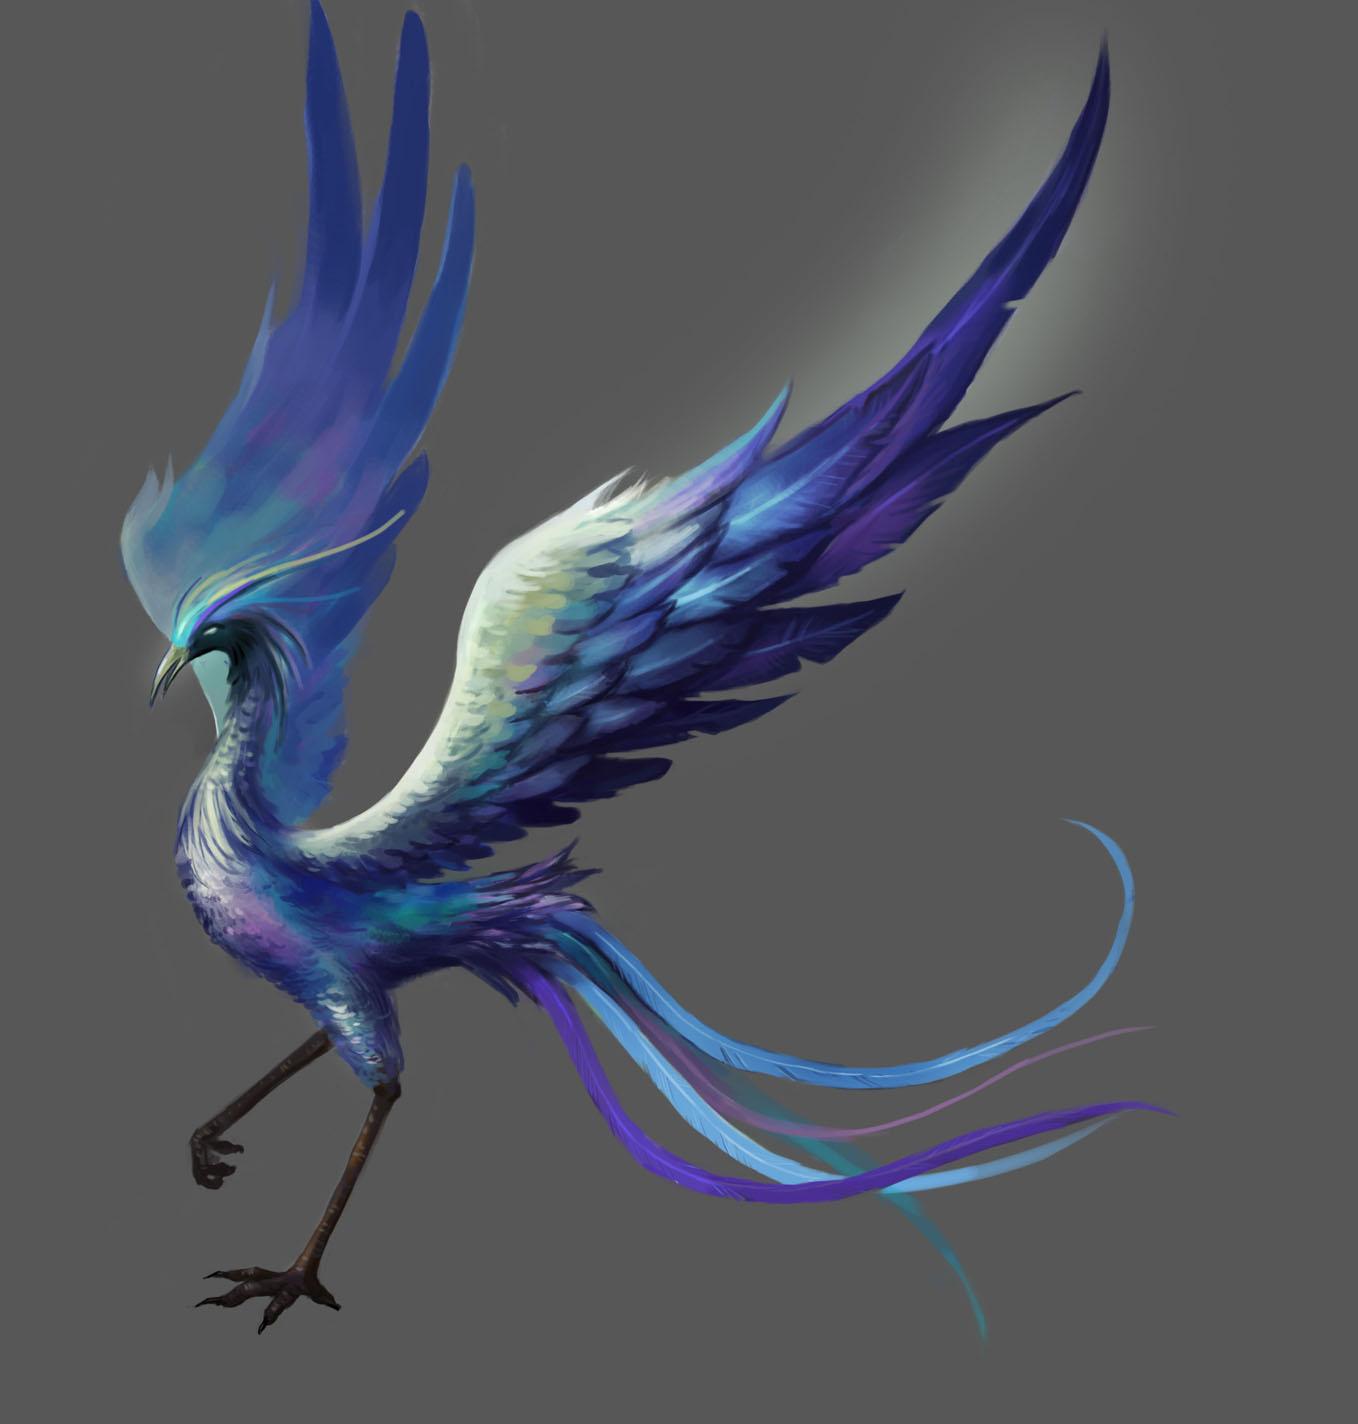 luan-blue phoenix image source: http://tieba.baidu.com/p/1974783035?see_lz=1